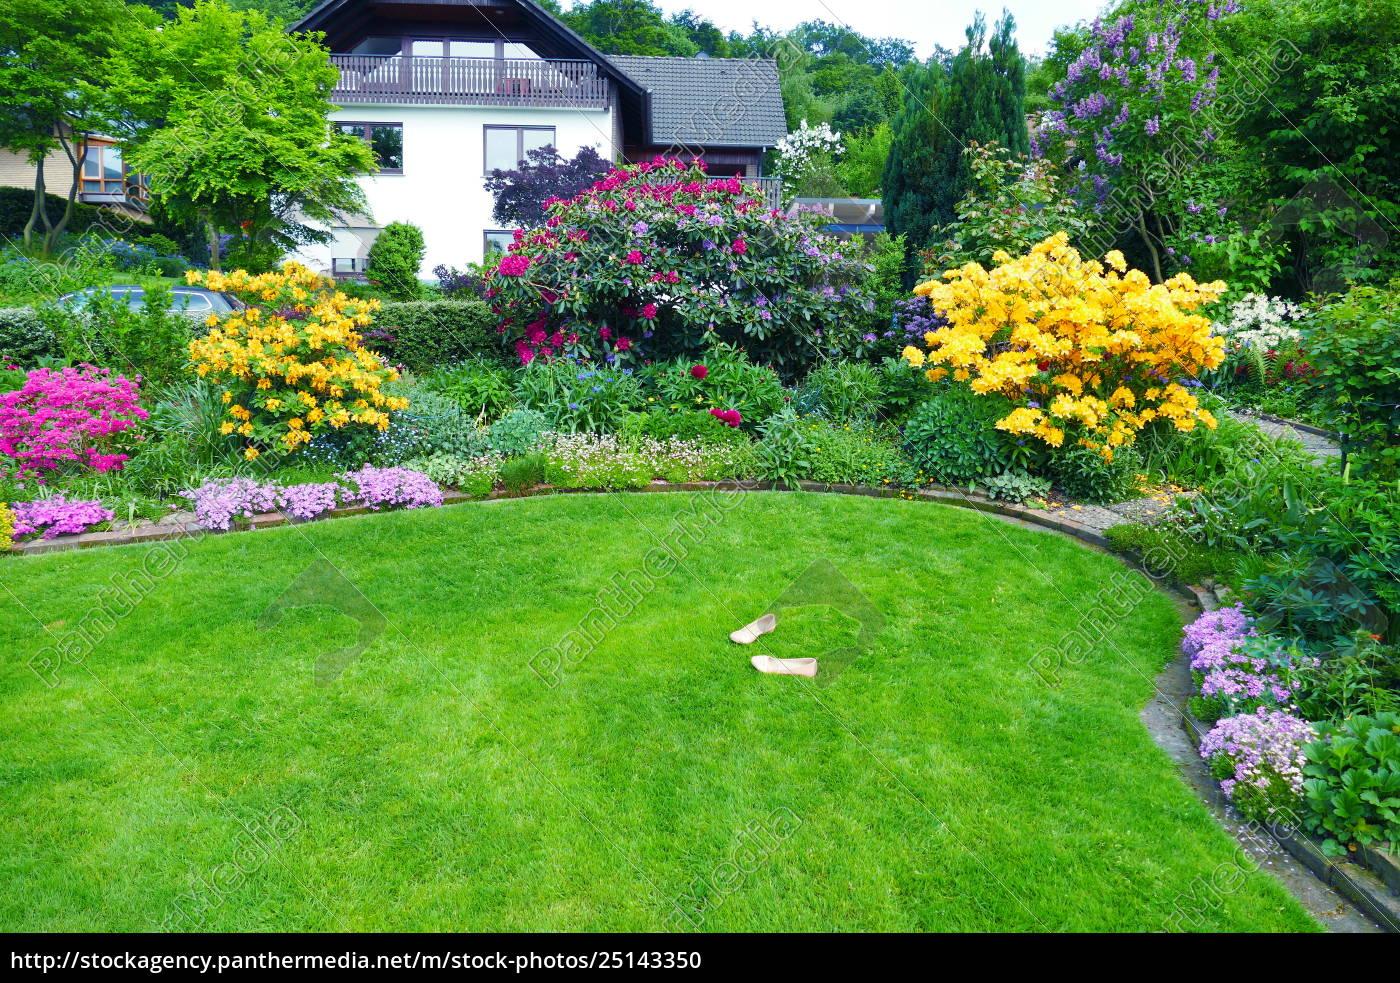 Stock Photo 25143350   Schöner Garten